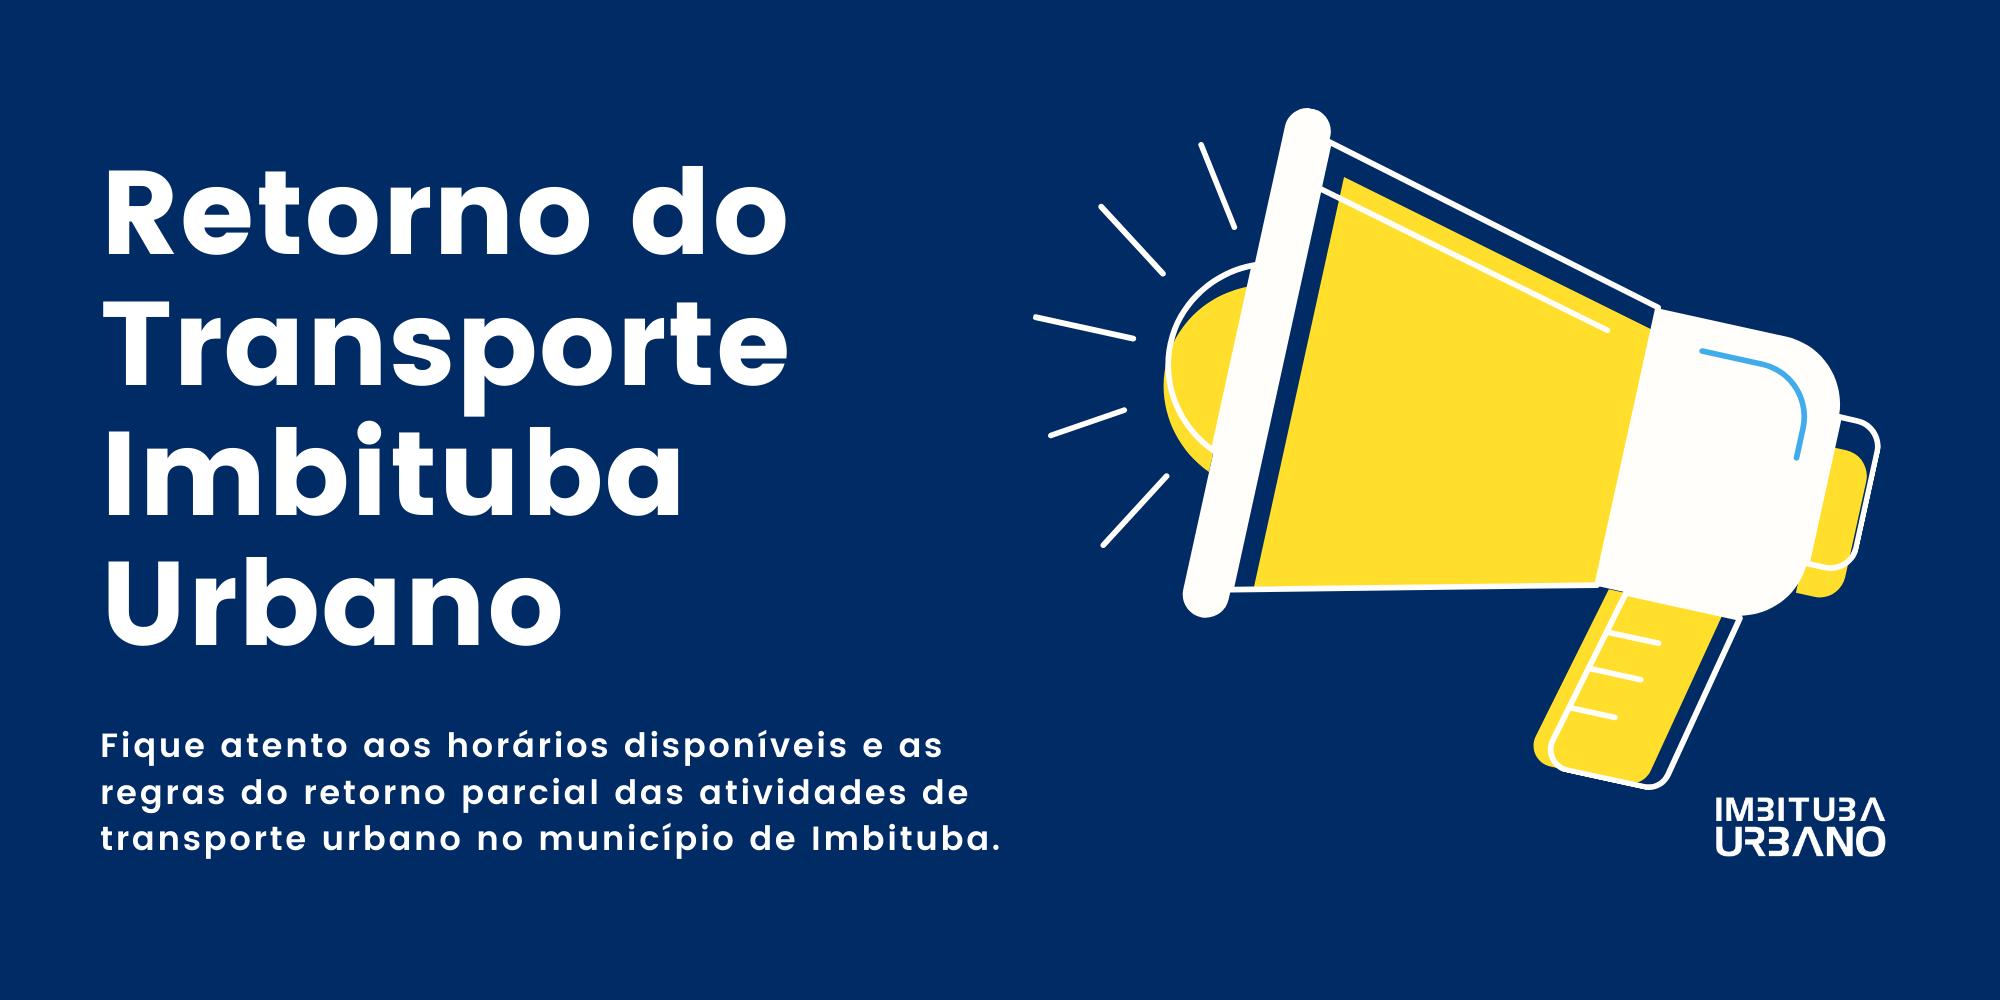 Comunicado_-_Imbituba_Urbano_(3).png